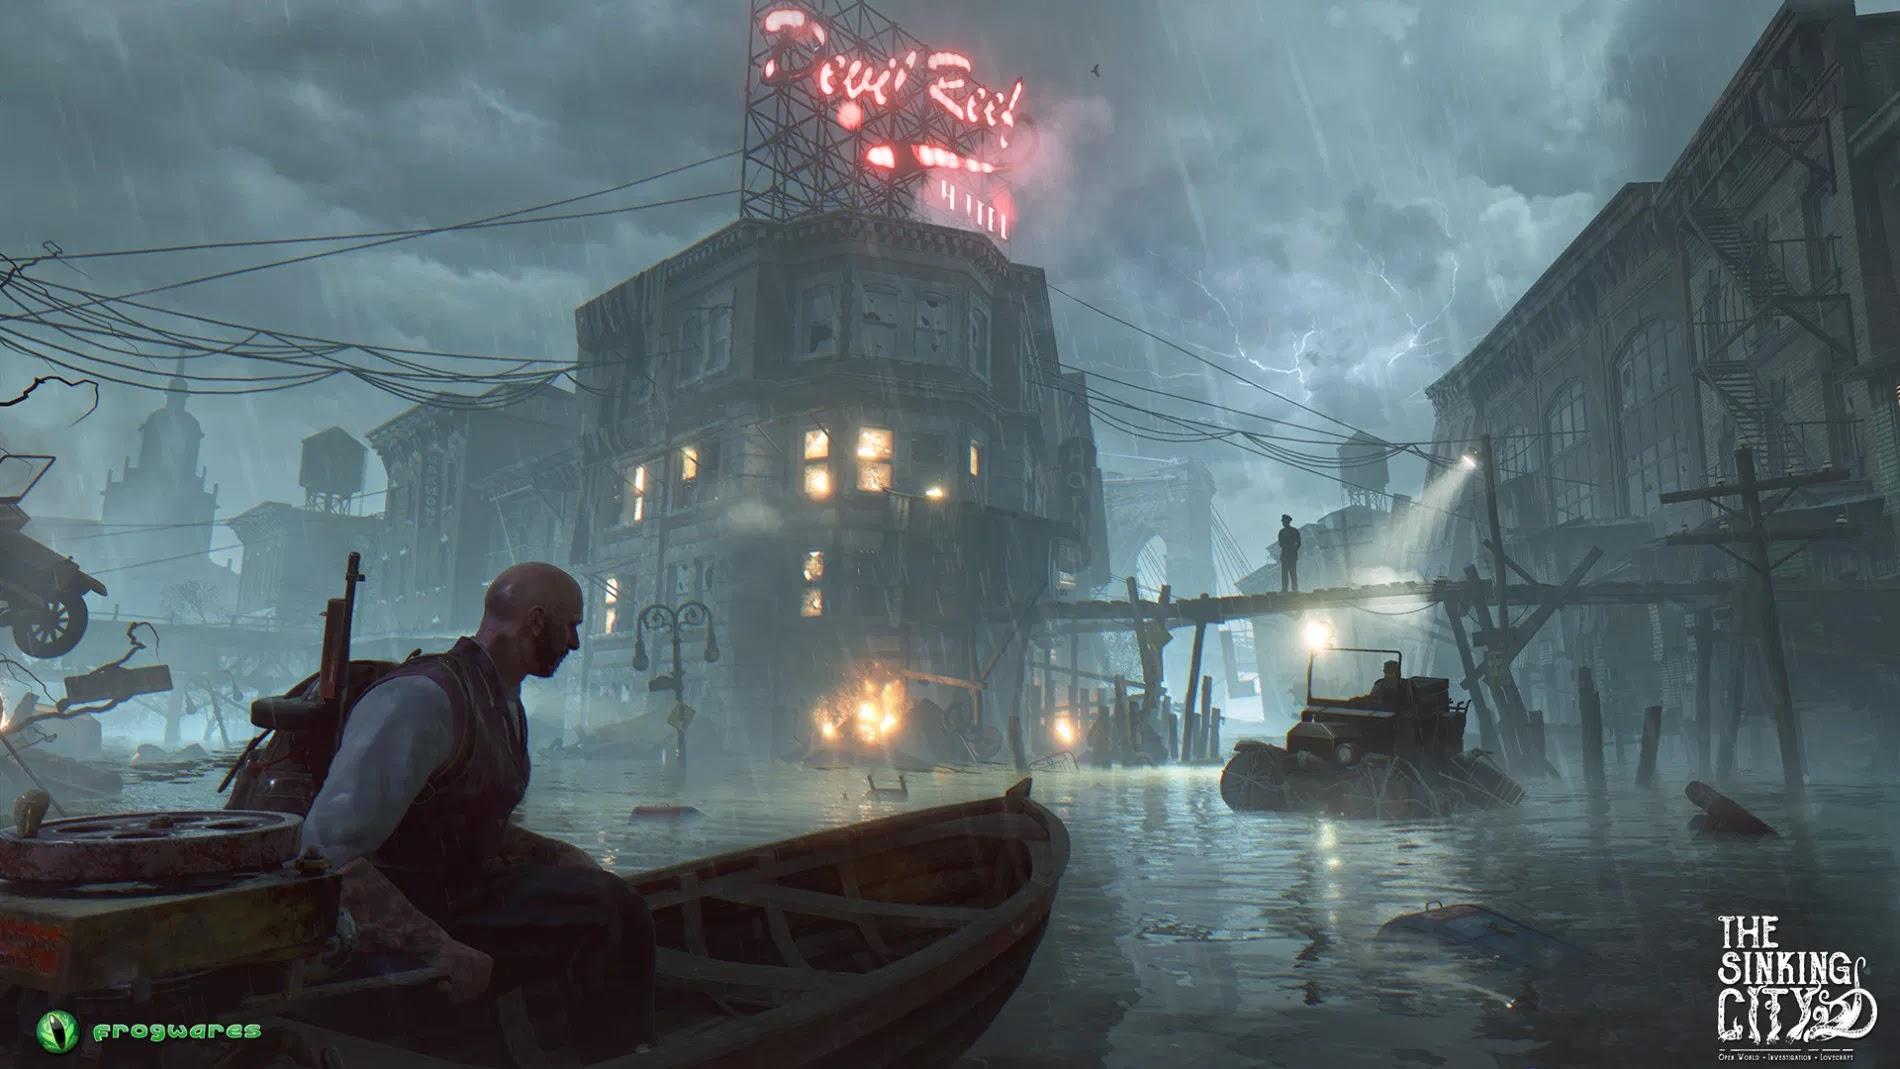 The Sinking City Steam